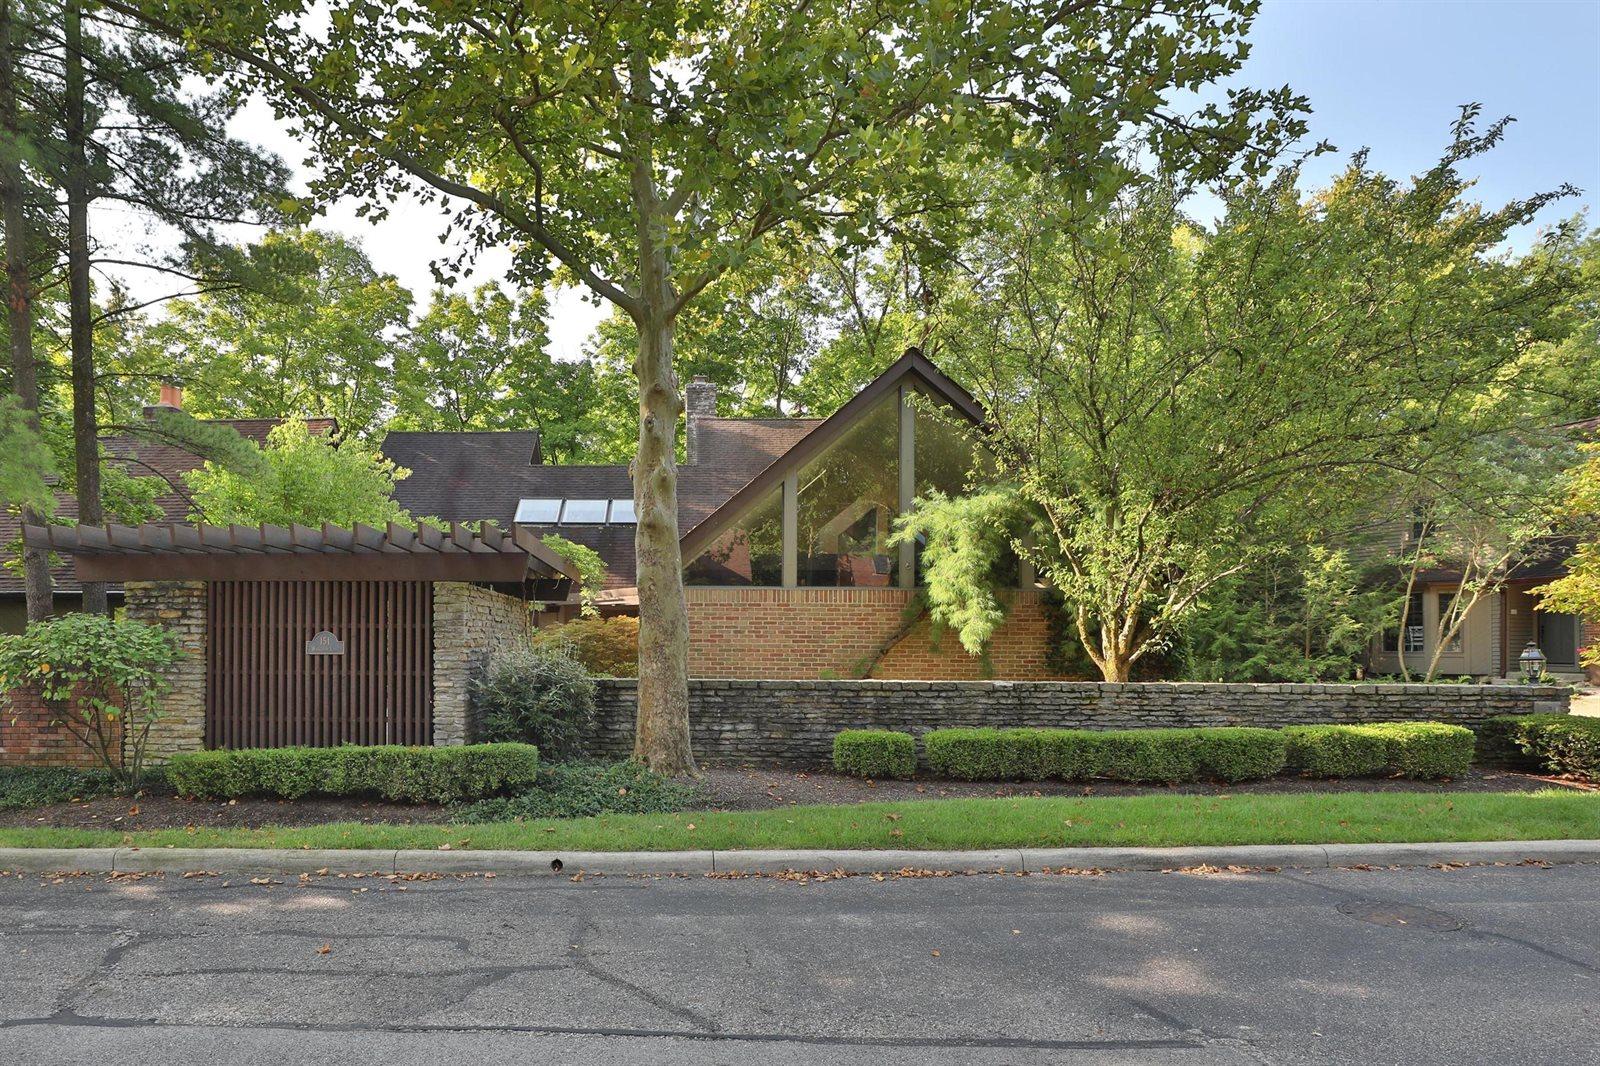 151 Whieldon Lane, #9, Worthington, OH 43085